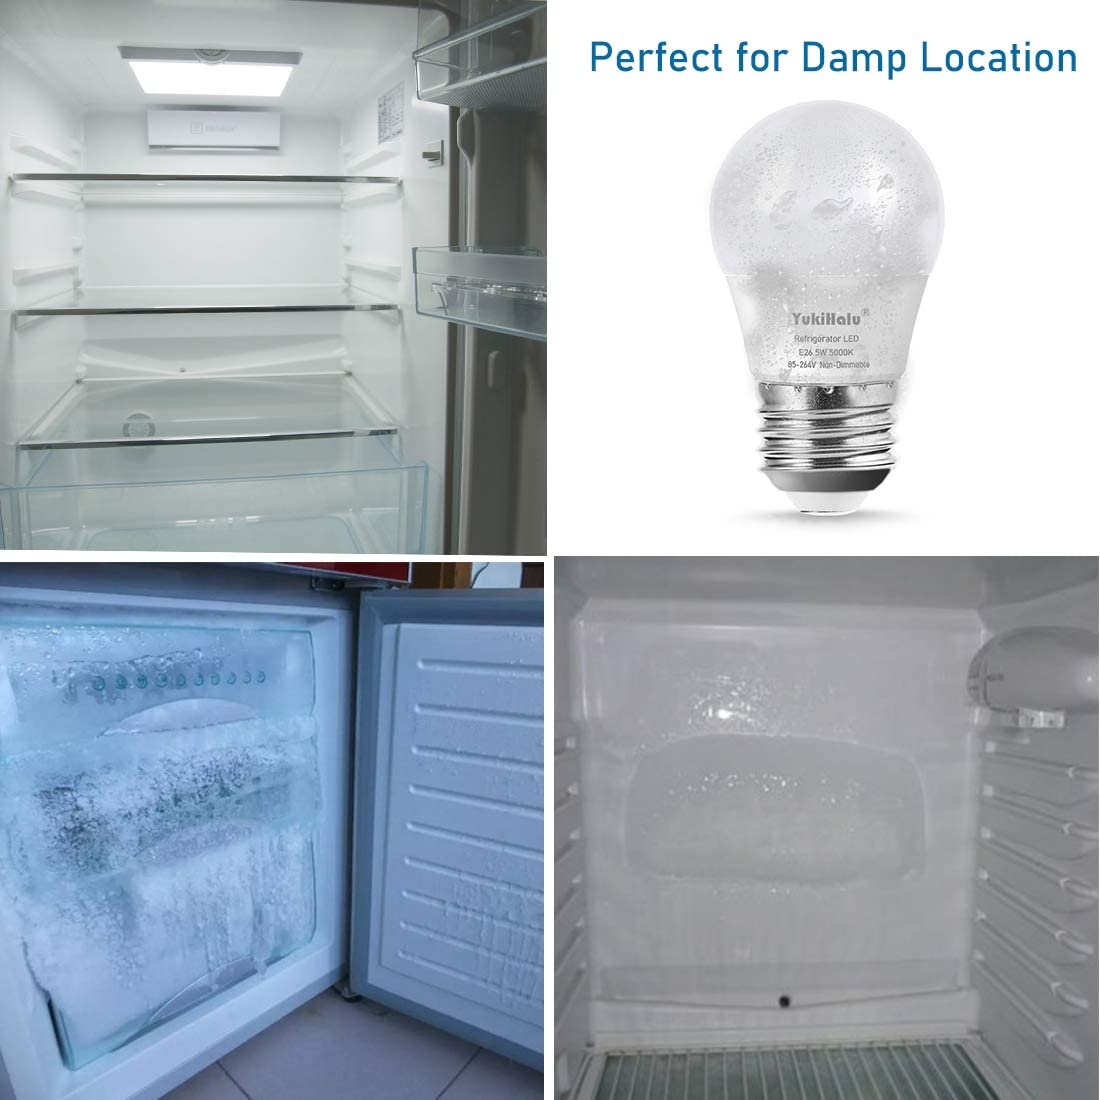 450 Lumen 5W Daylight 5000K E26 Medium Base LED Refrigerator Light Bulb 40W Equivalent A15 Appliance Fridge Bulbs Small Size Bulb Not Dimmable 2-Pack for Damp Location Waterproof